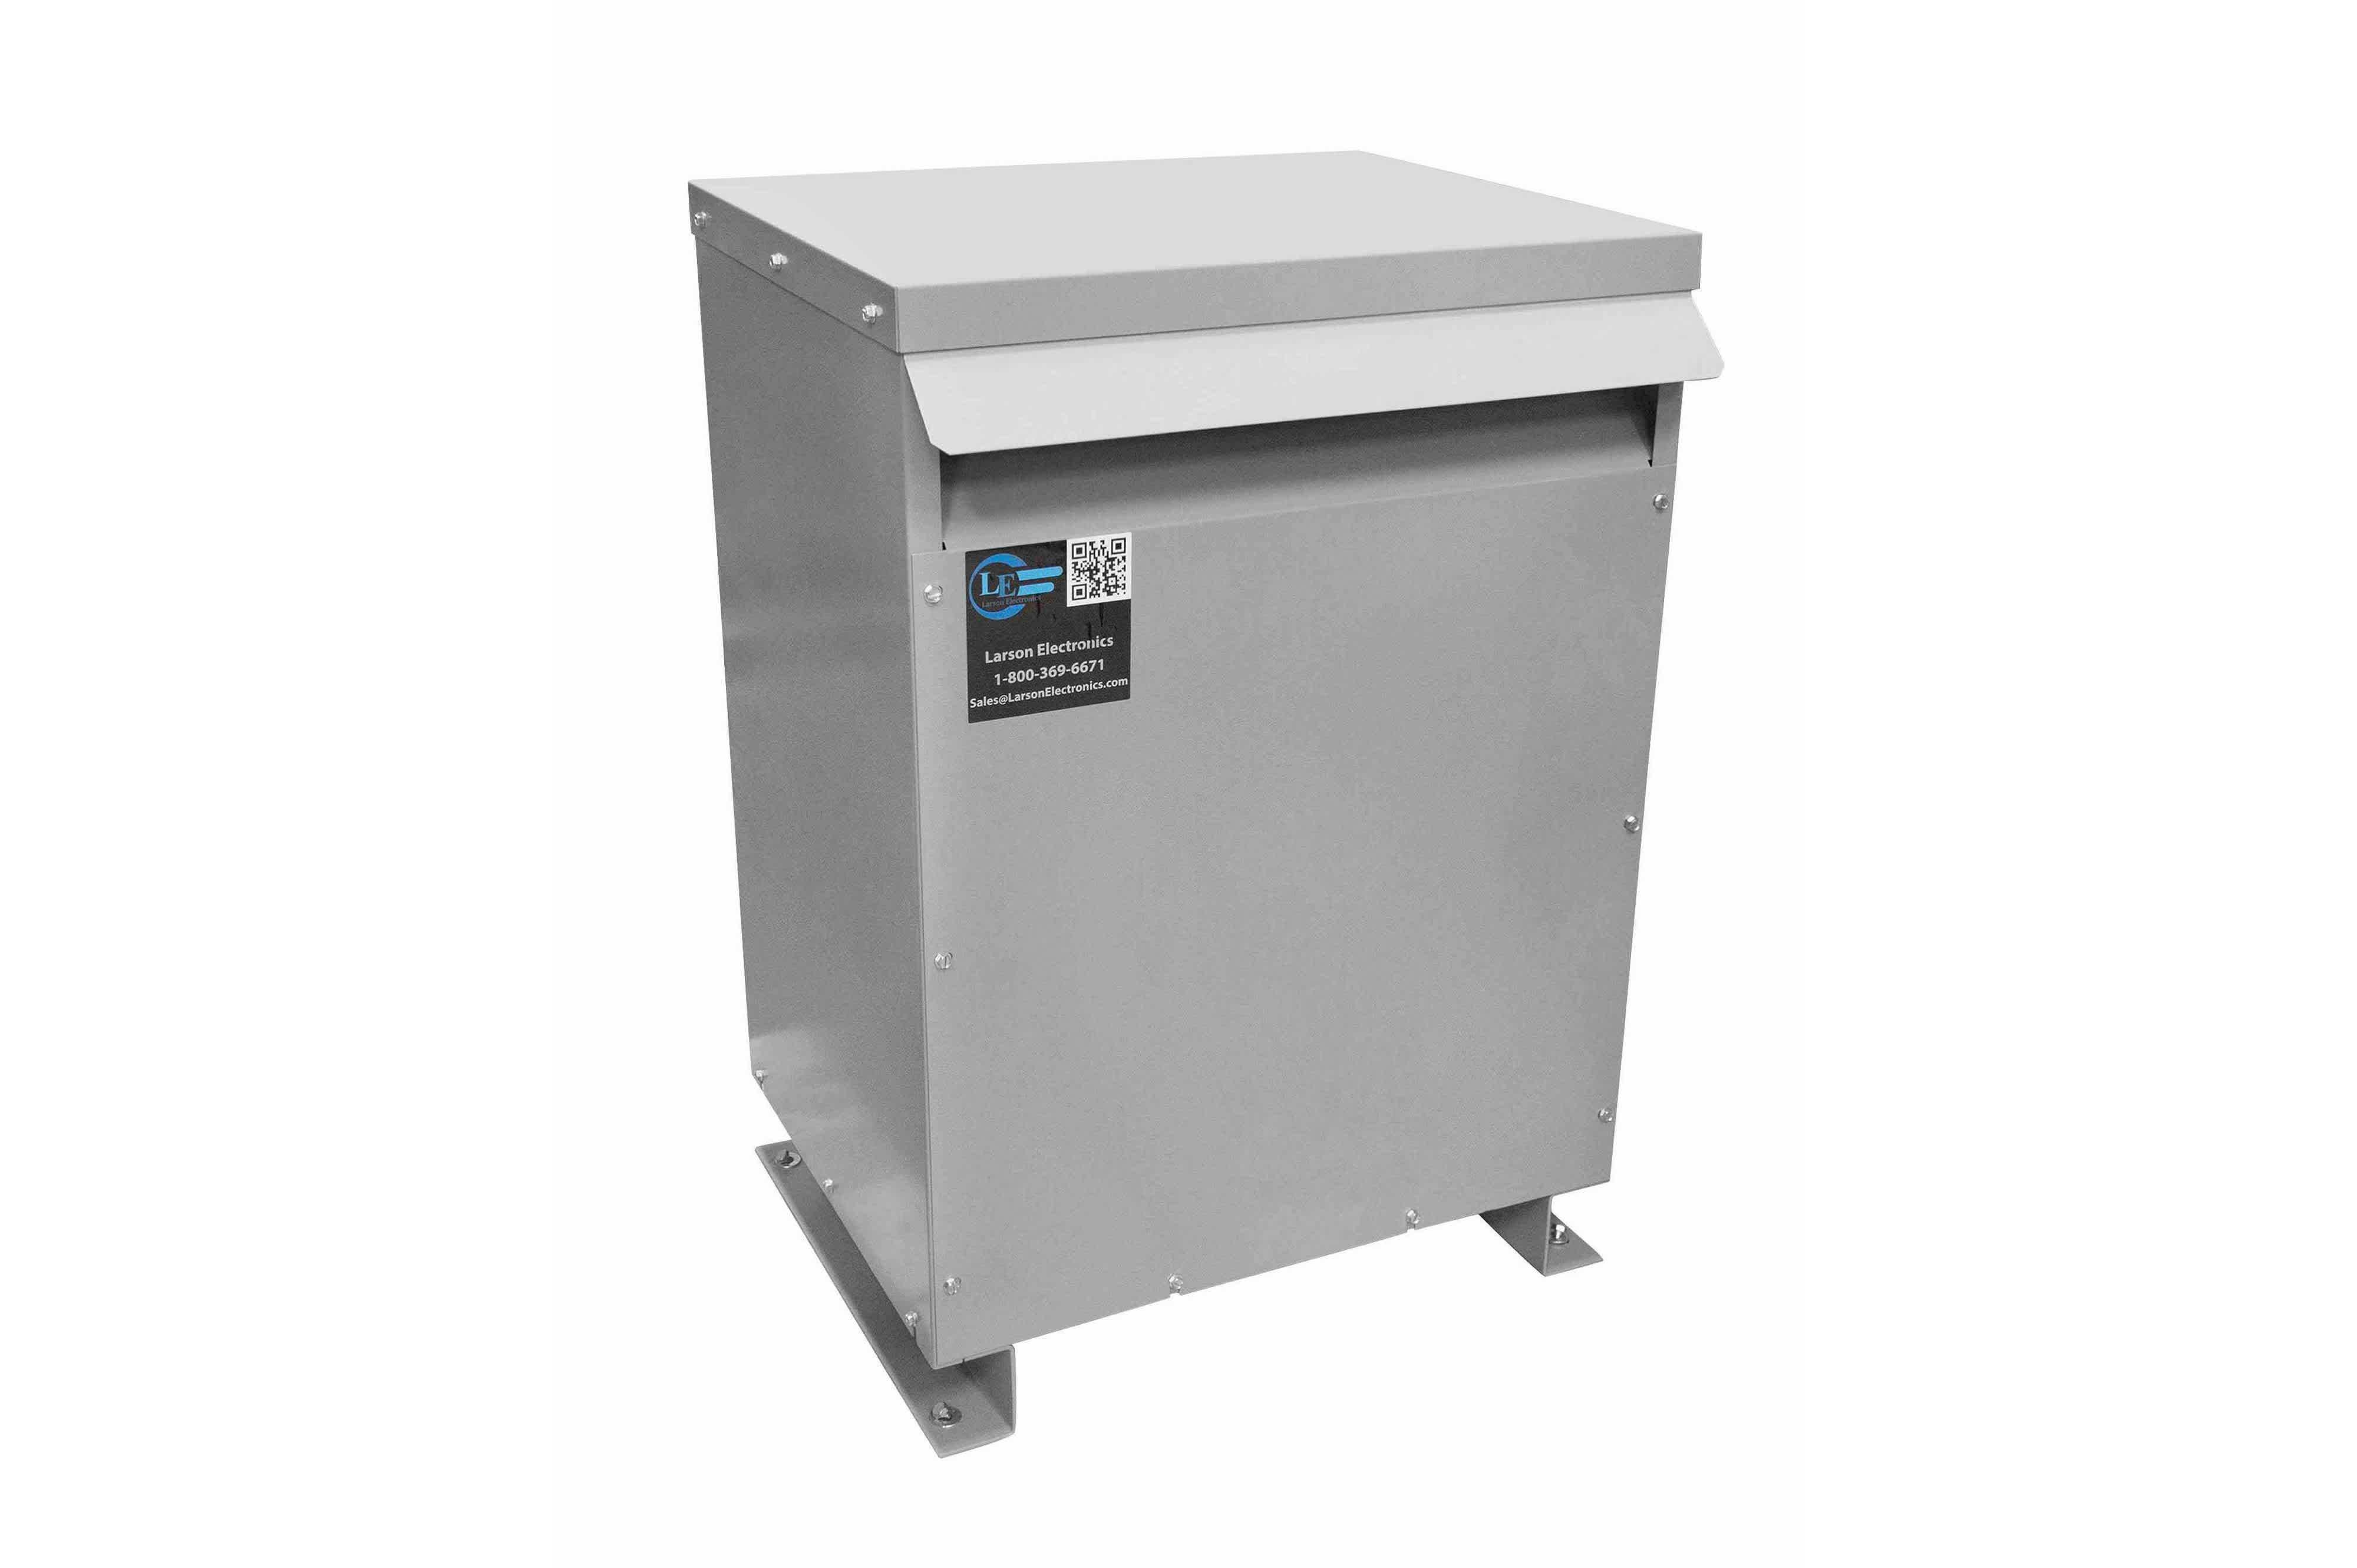 800 kVA 3PH Isolation Transformer, 600V Wye Primary, 240V/120 Delta Secondary, N3R, Ventilated, 60 Hz